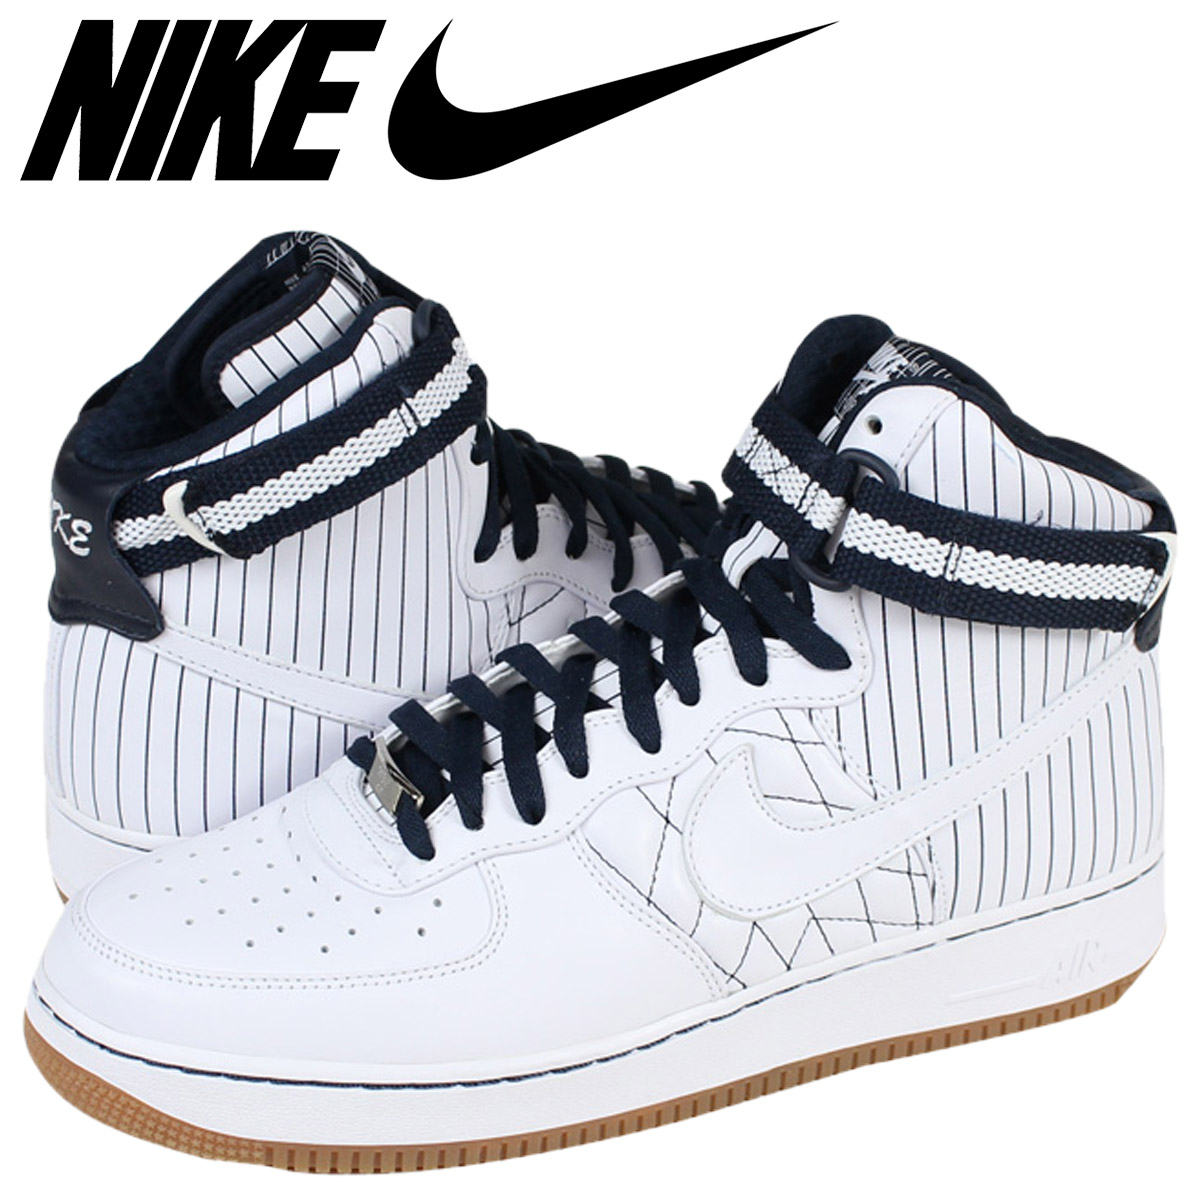 5293fc69aedb SneaK Online Shop  Nike NIKE air force 1 sneakers AIR FORCE 1 HI NYC ...